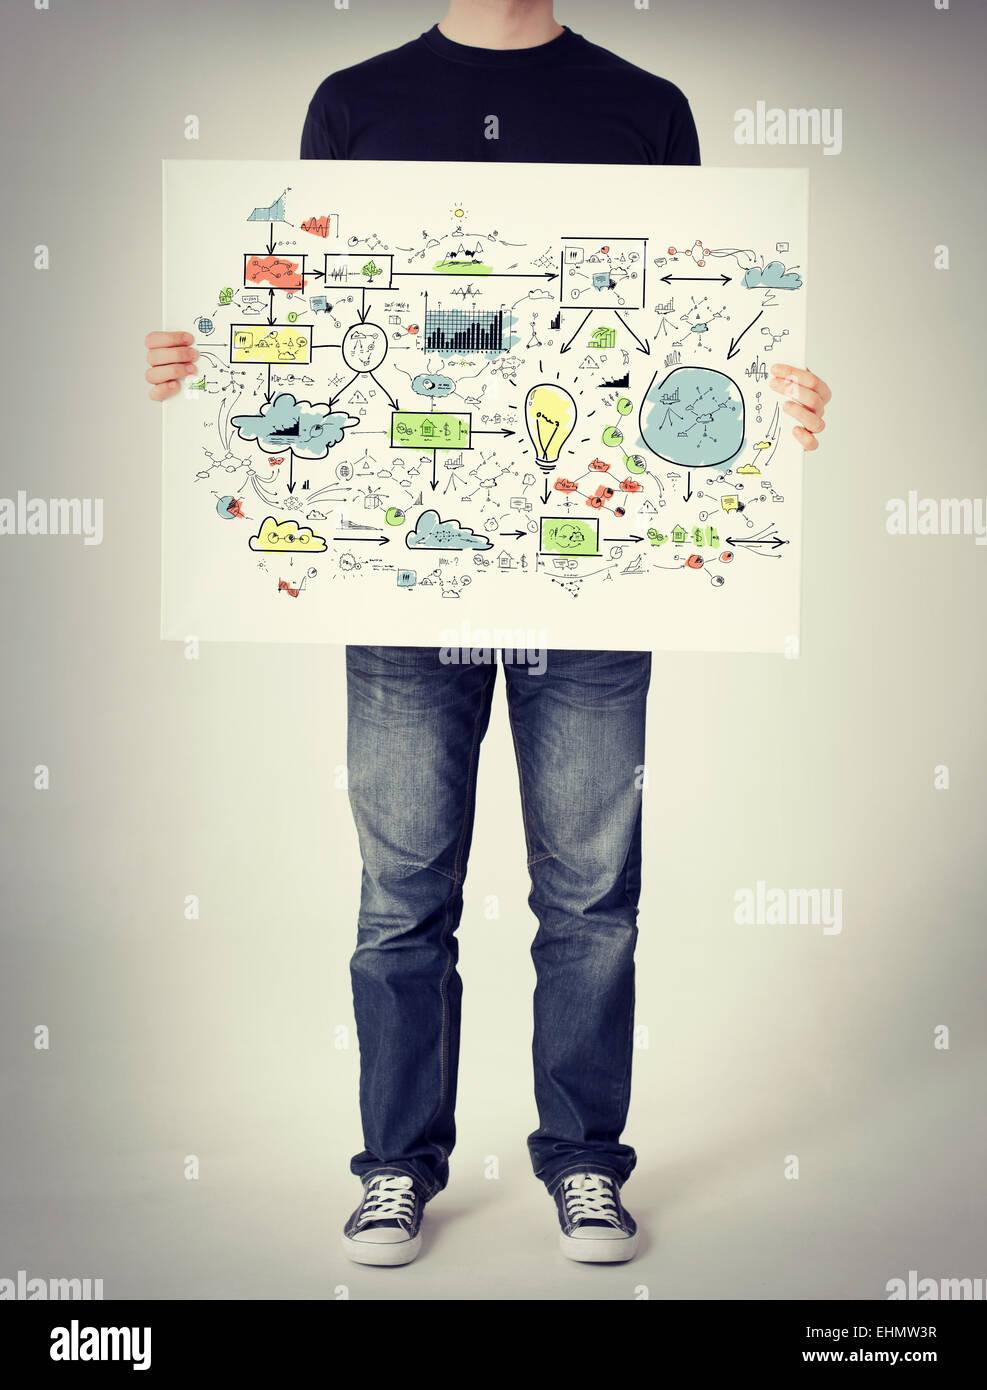 man showing big plan on white board Stock Photo